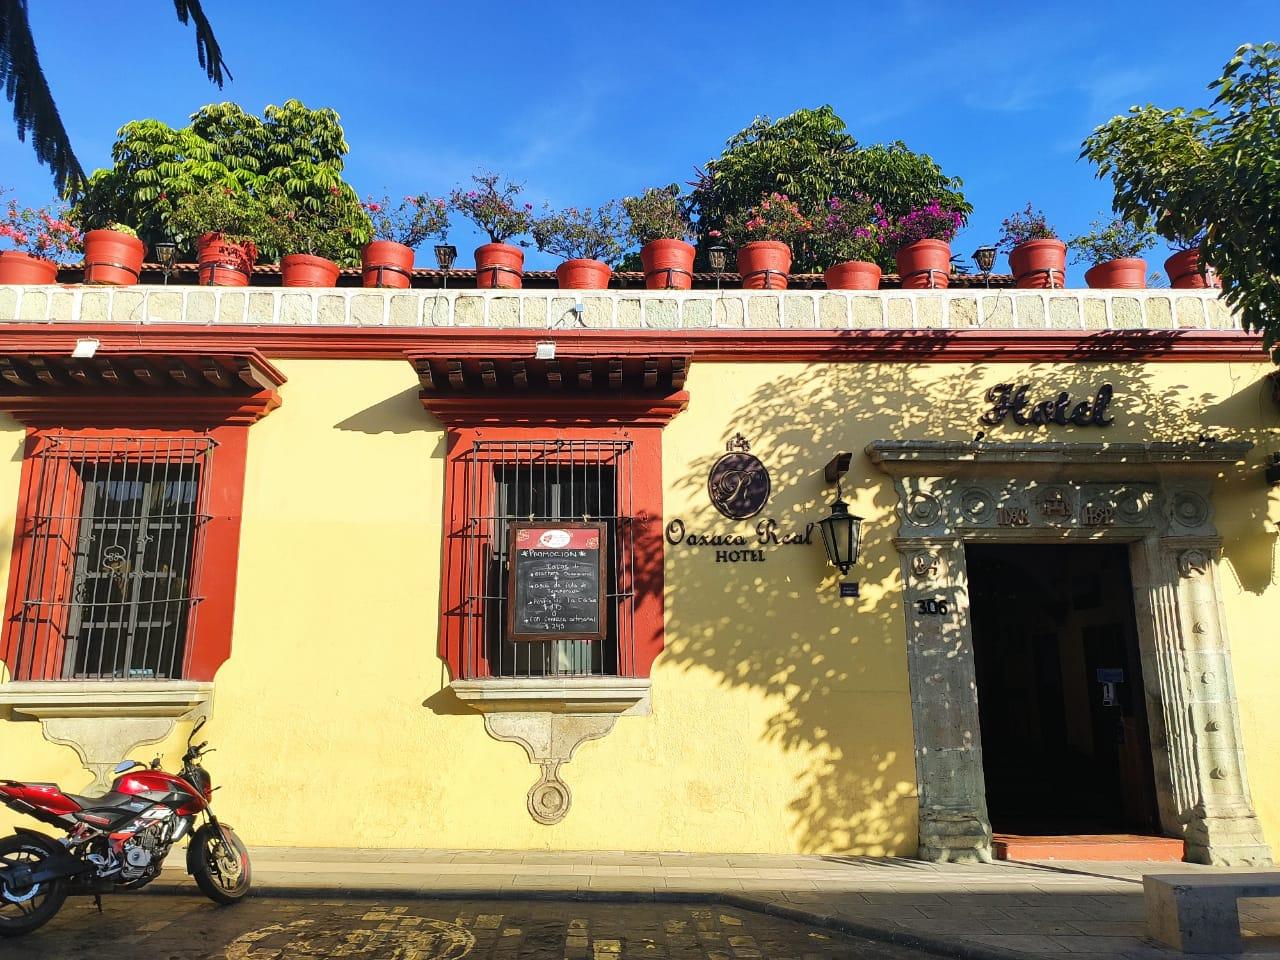 En 10 meses, pandemia redujo más de 50% promedio de ocupación hotelera en destinos de Oaxaca